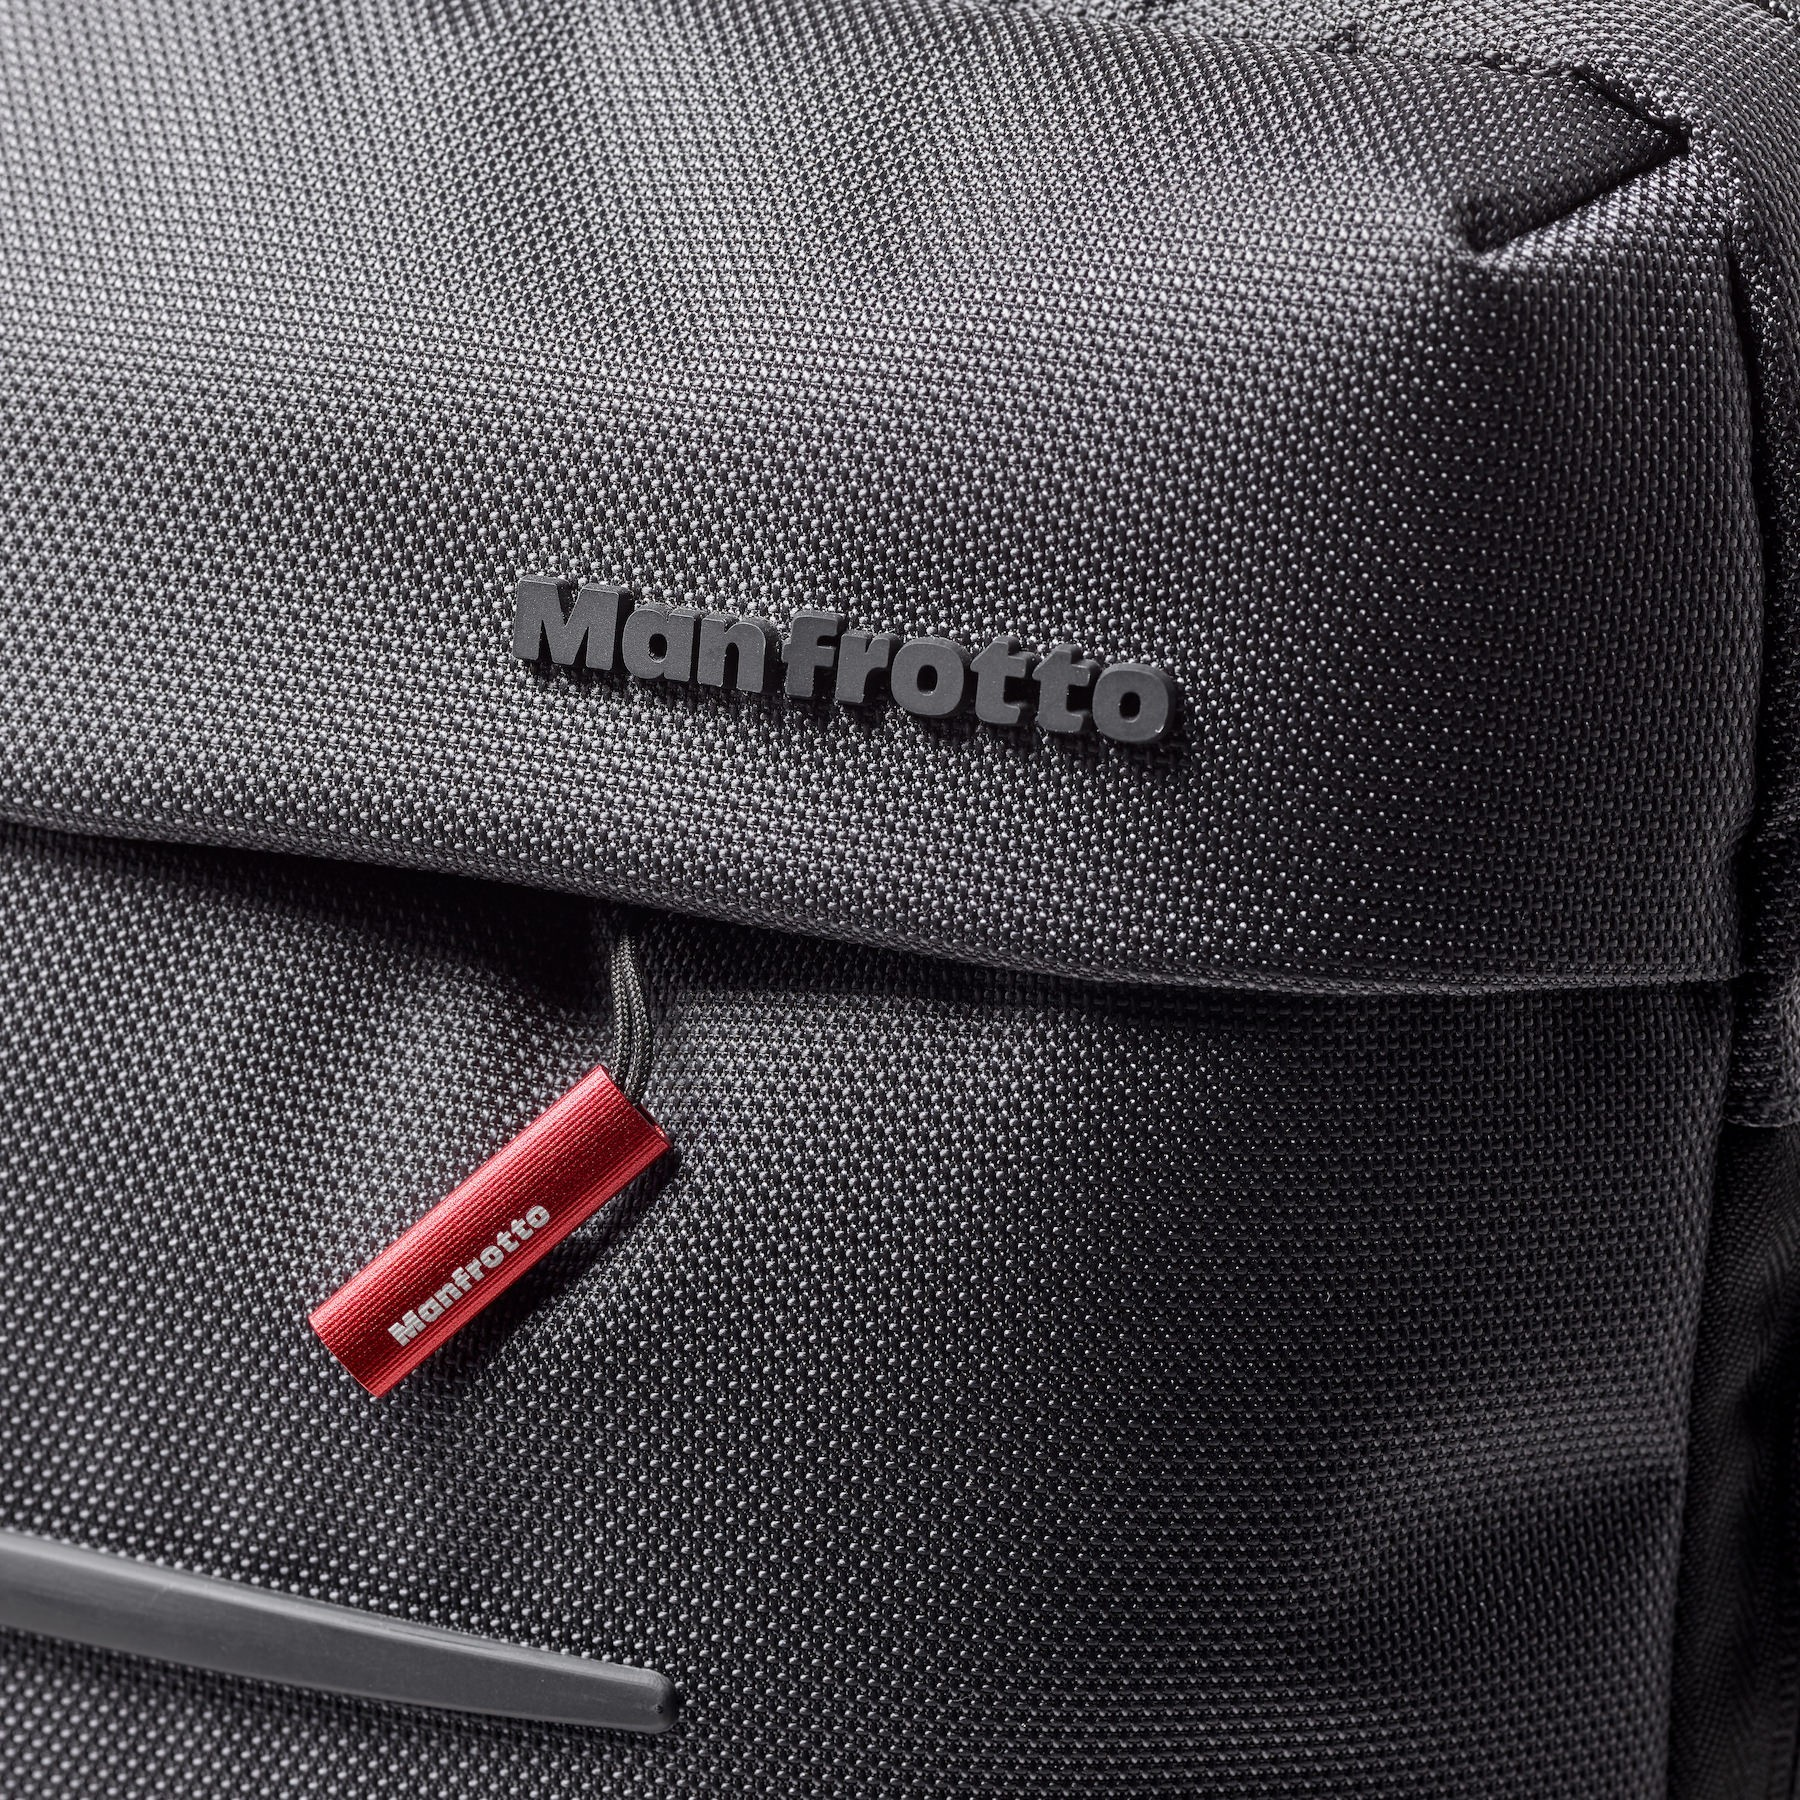 Manfrotto Manhattan Mover-50 MN-BP-MV-50